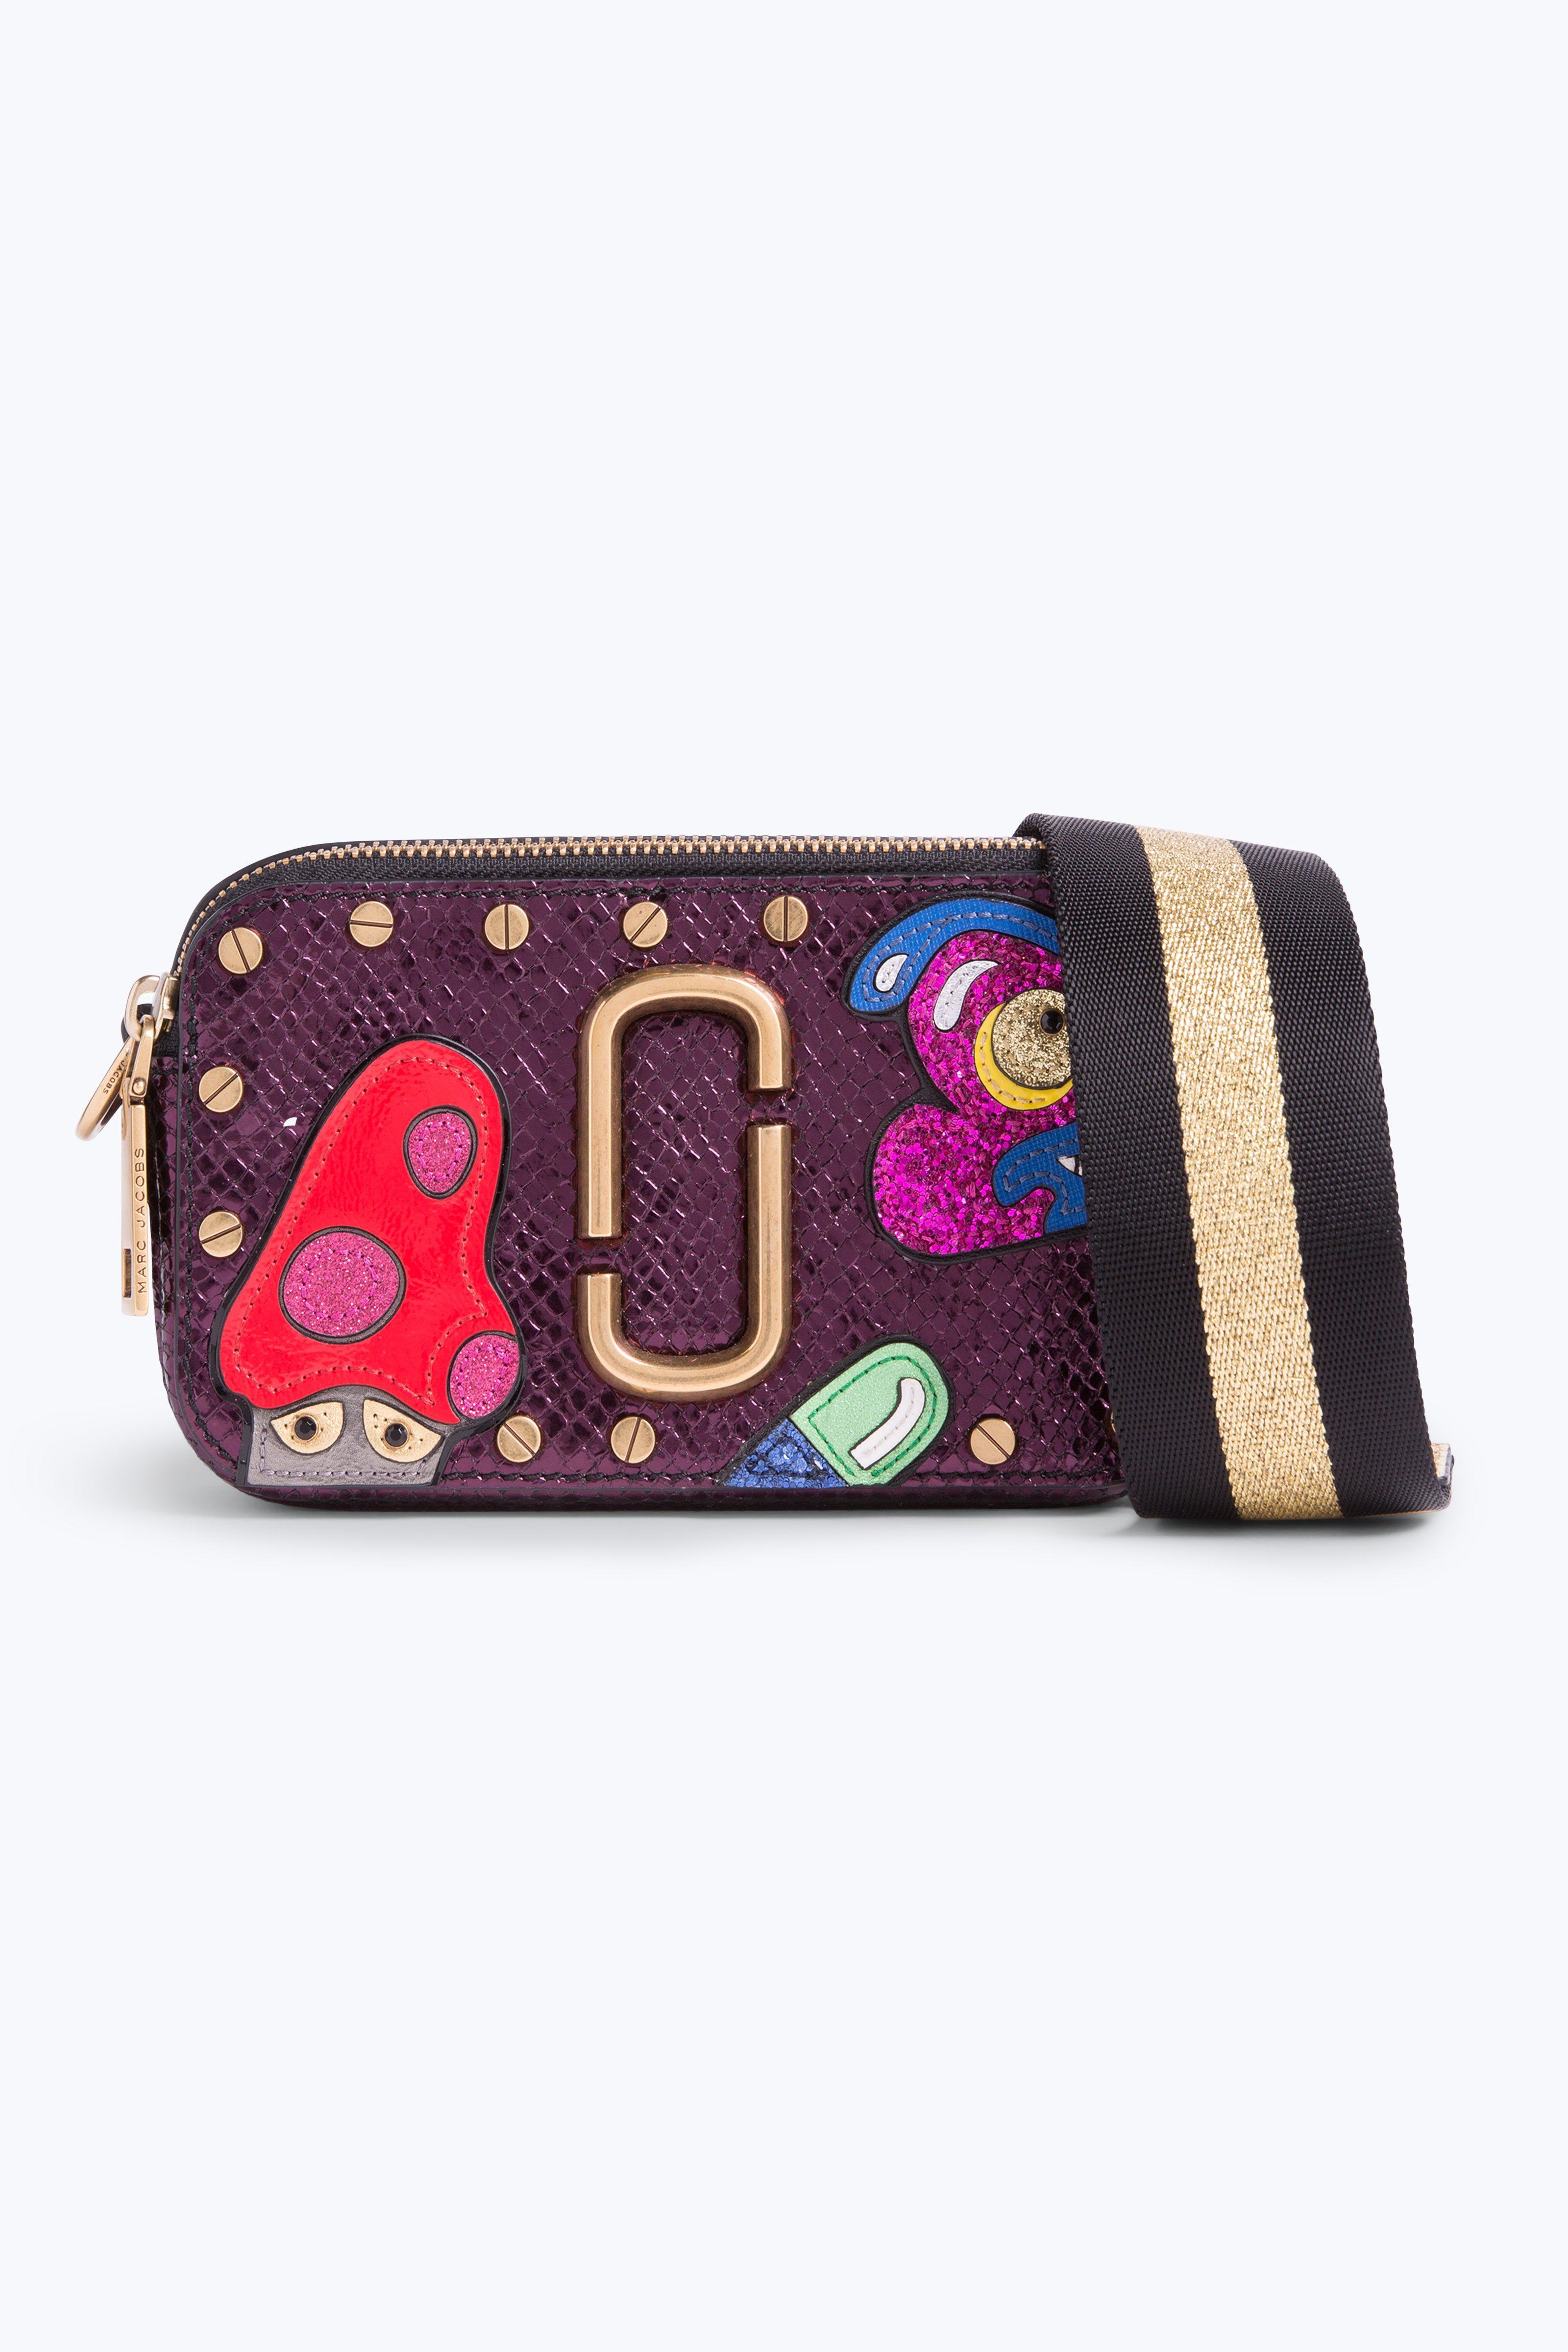 Mushroom Snapshot Small Camera Bag - Marc Jacobs.